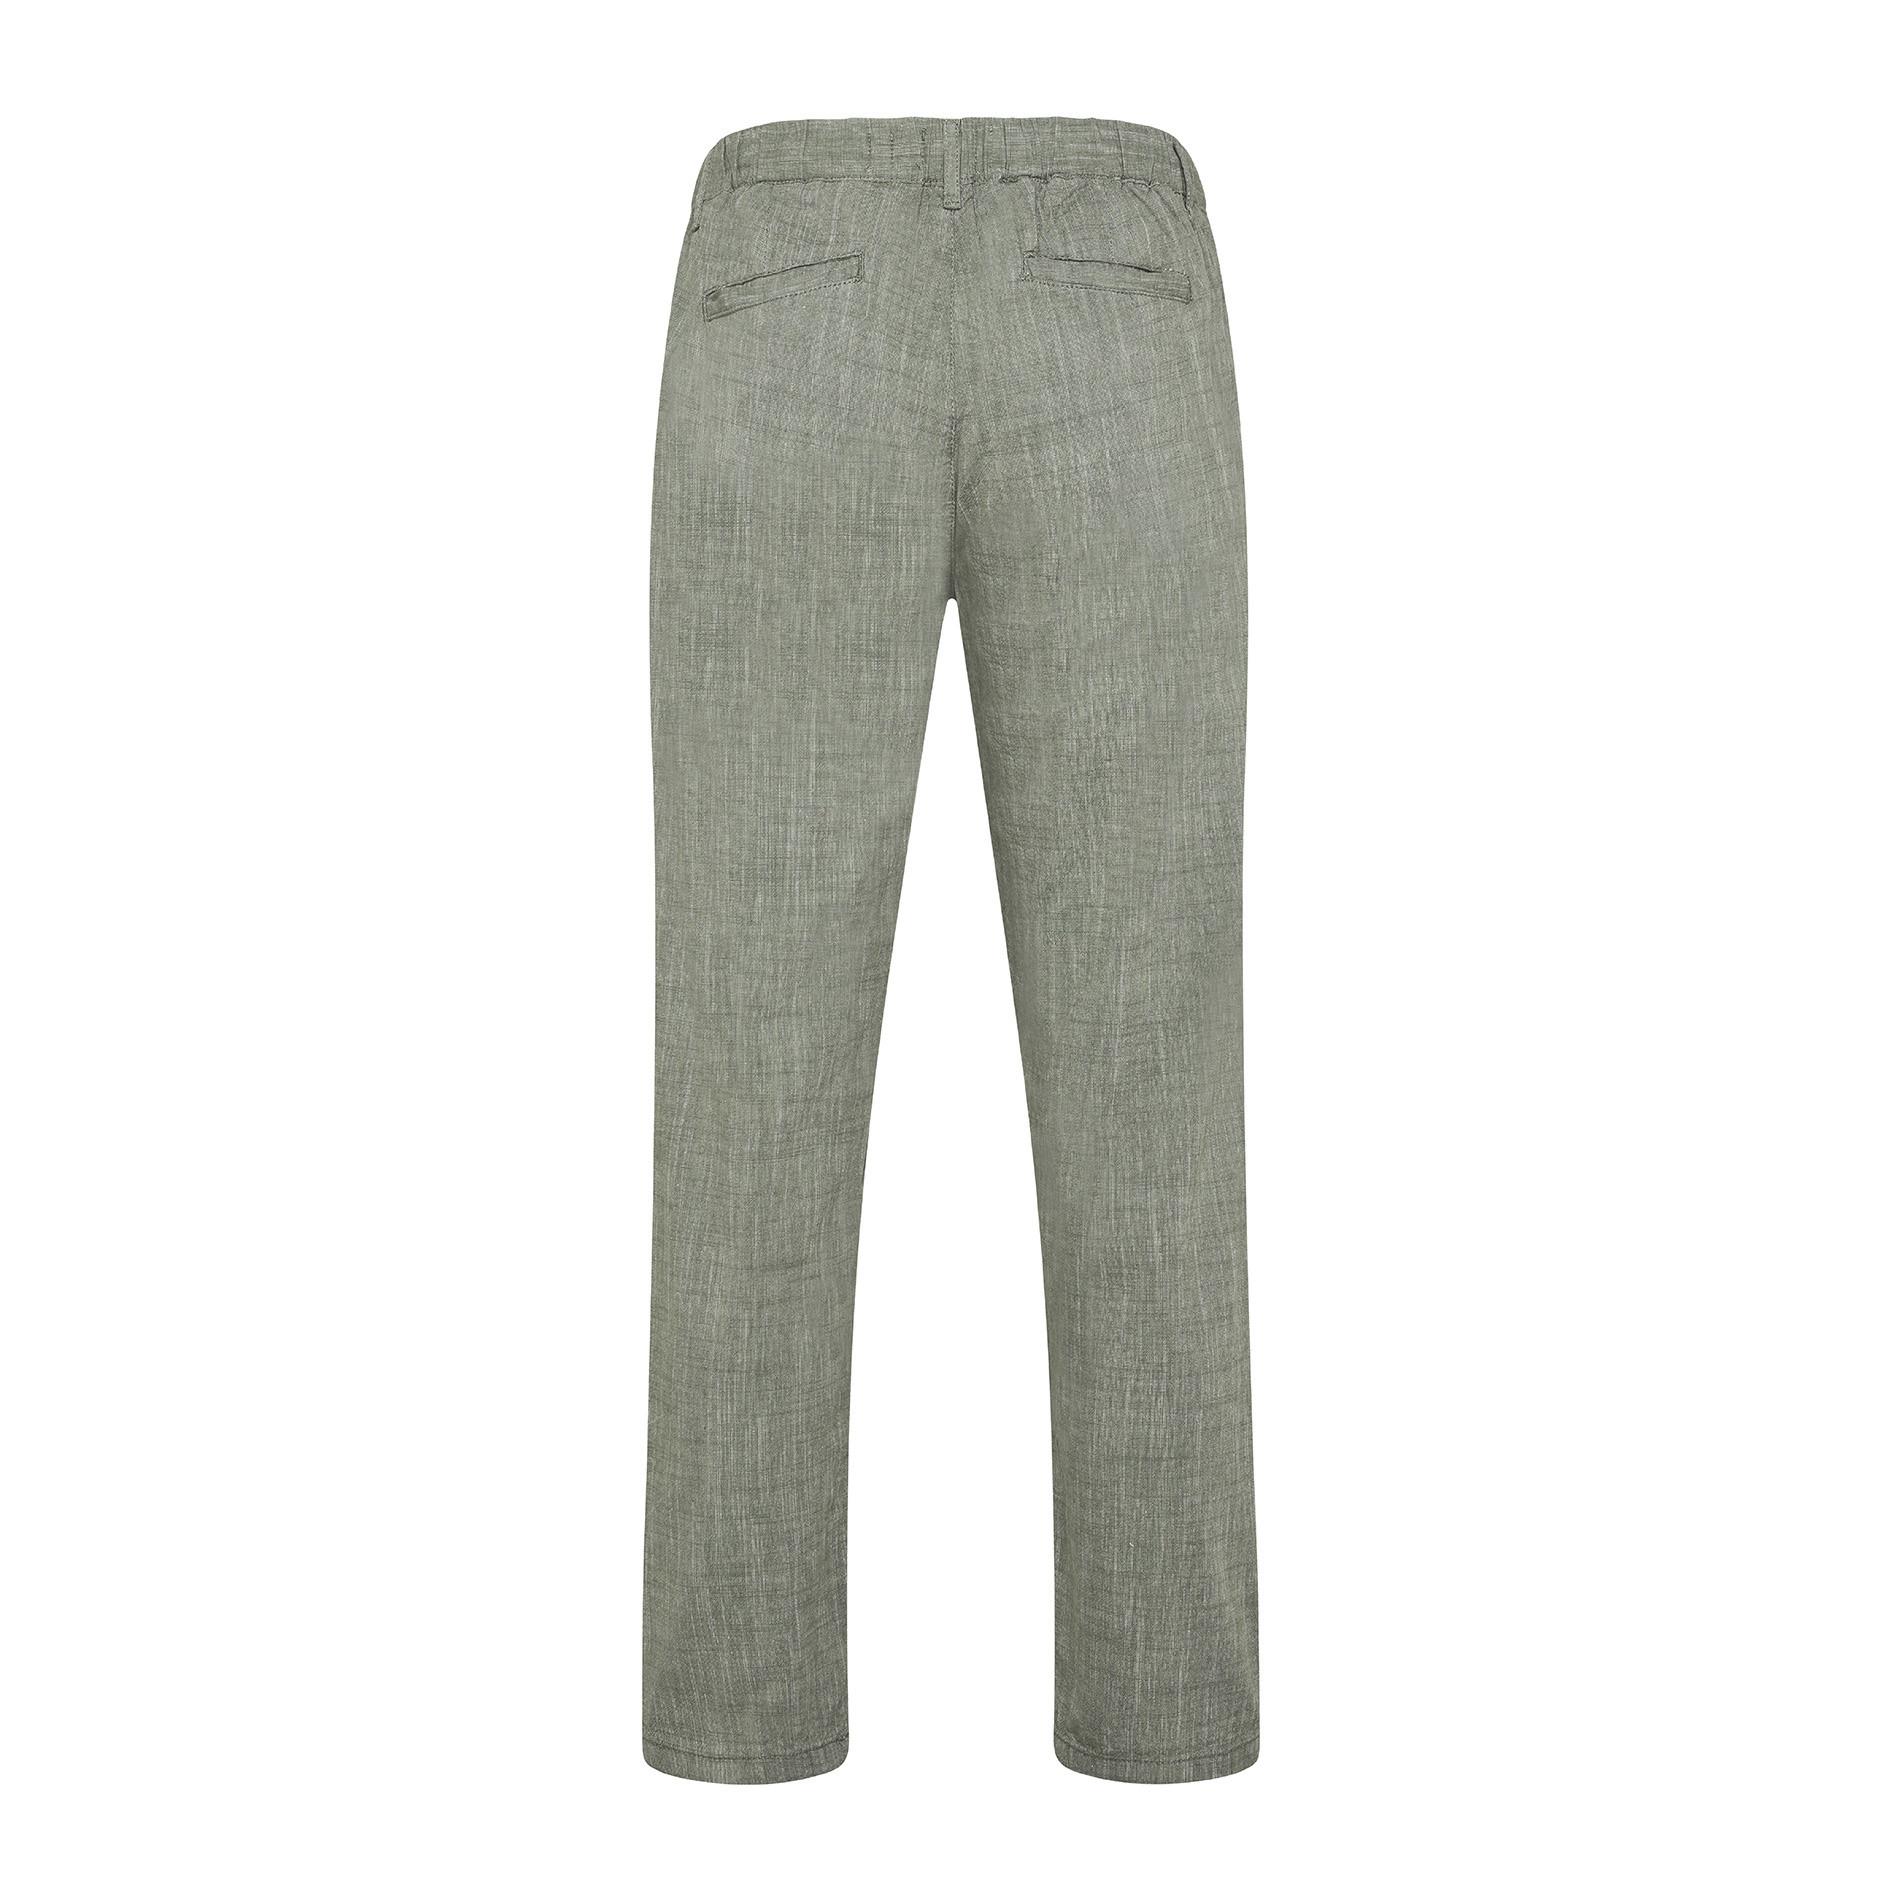 Pantalone puro cotone light JCT, Verde chiaro, large image number 1